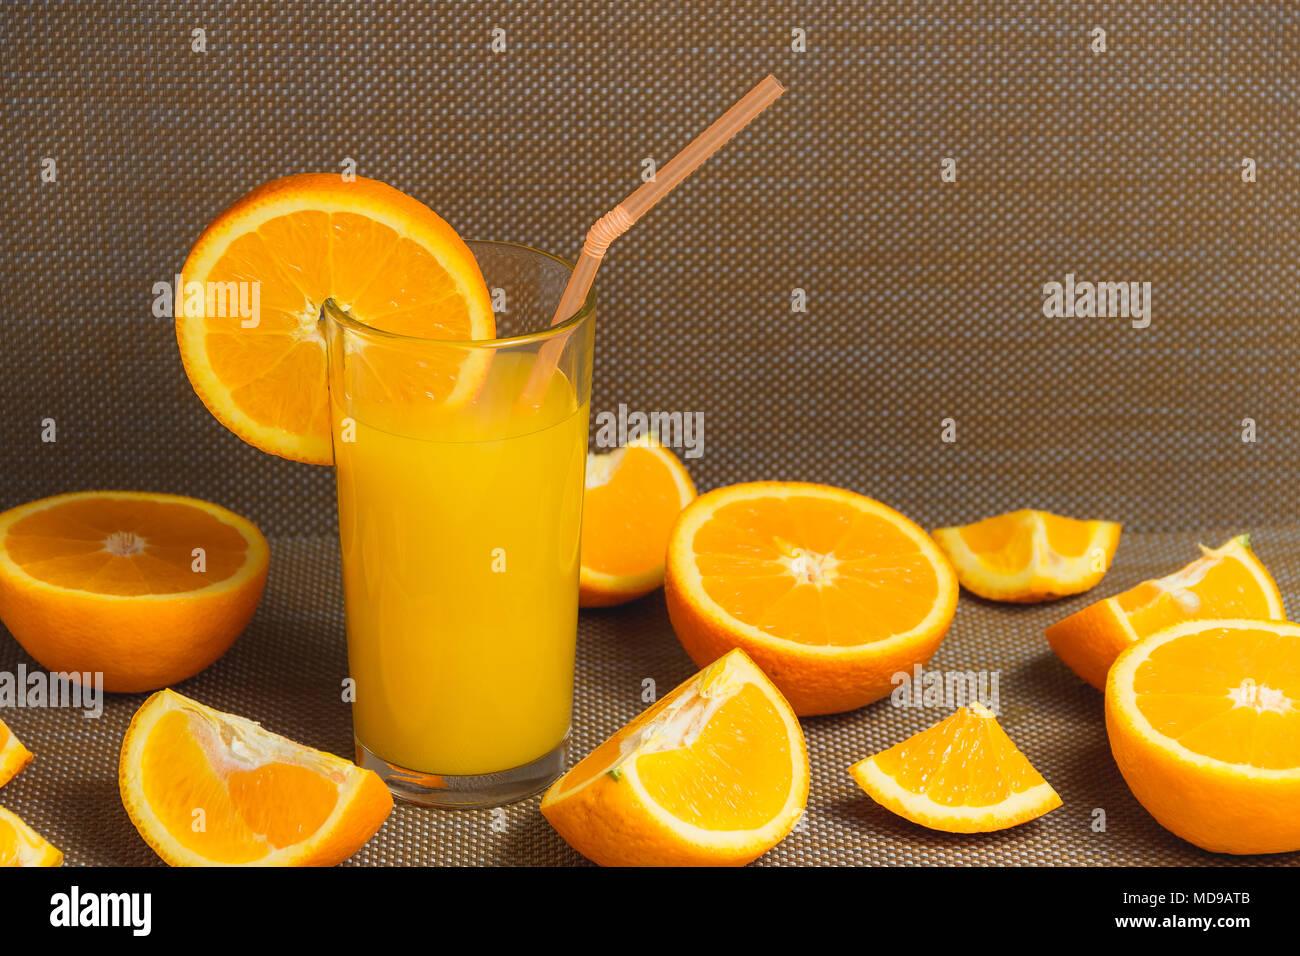 Sliced Orange and Juice Drink on Dark Background. Healthy Concept. - Stock Image